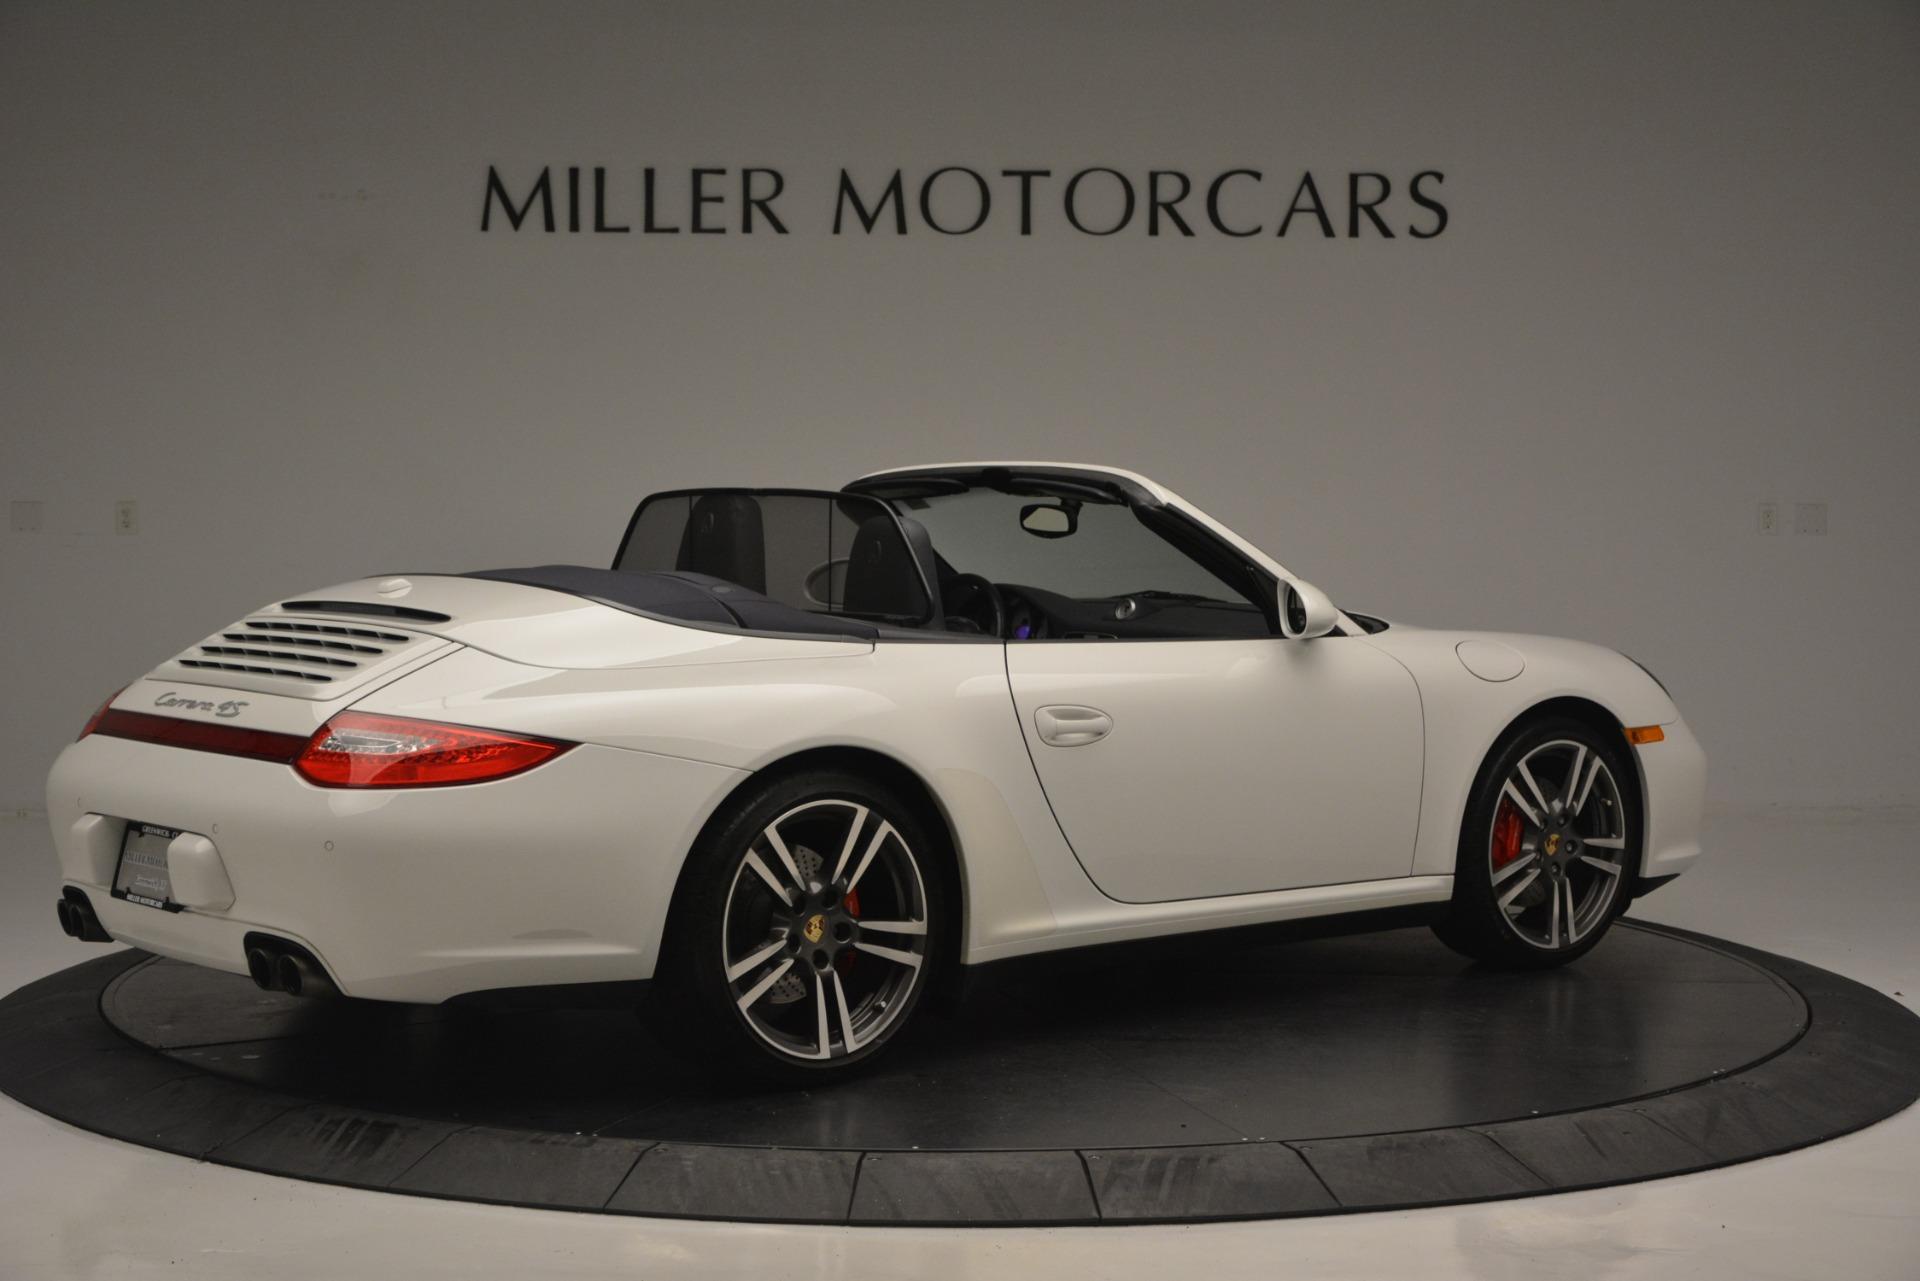 Used 2011 Porsche 911 Carrera 4S For Sale 0 In Greenwich, CT